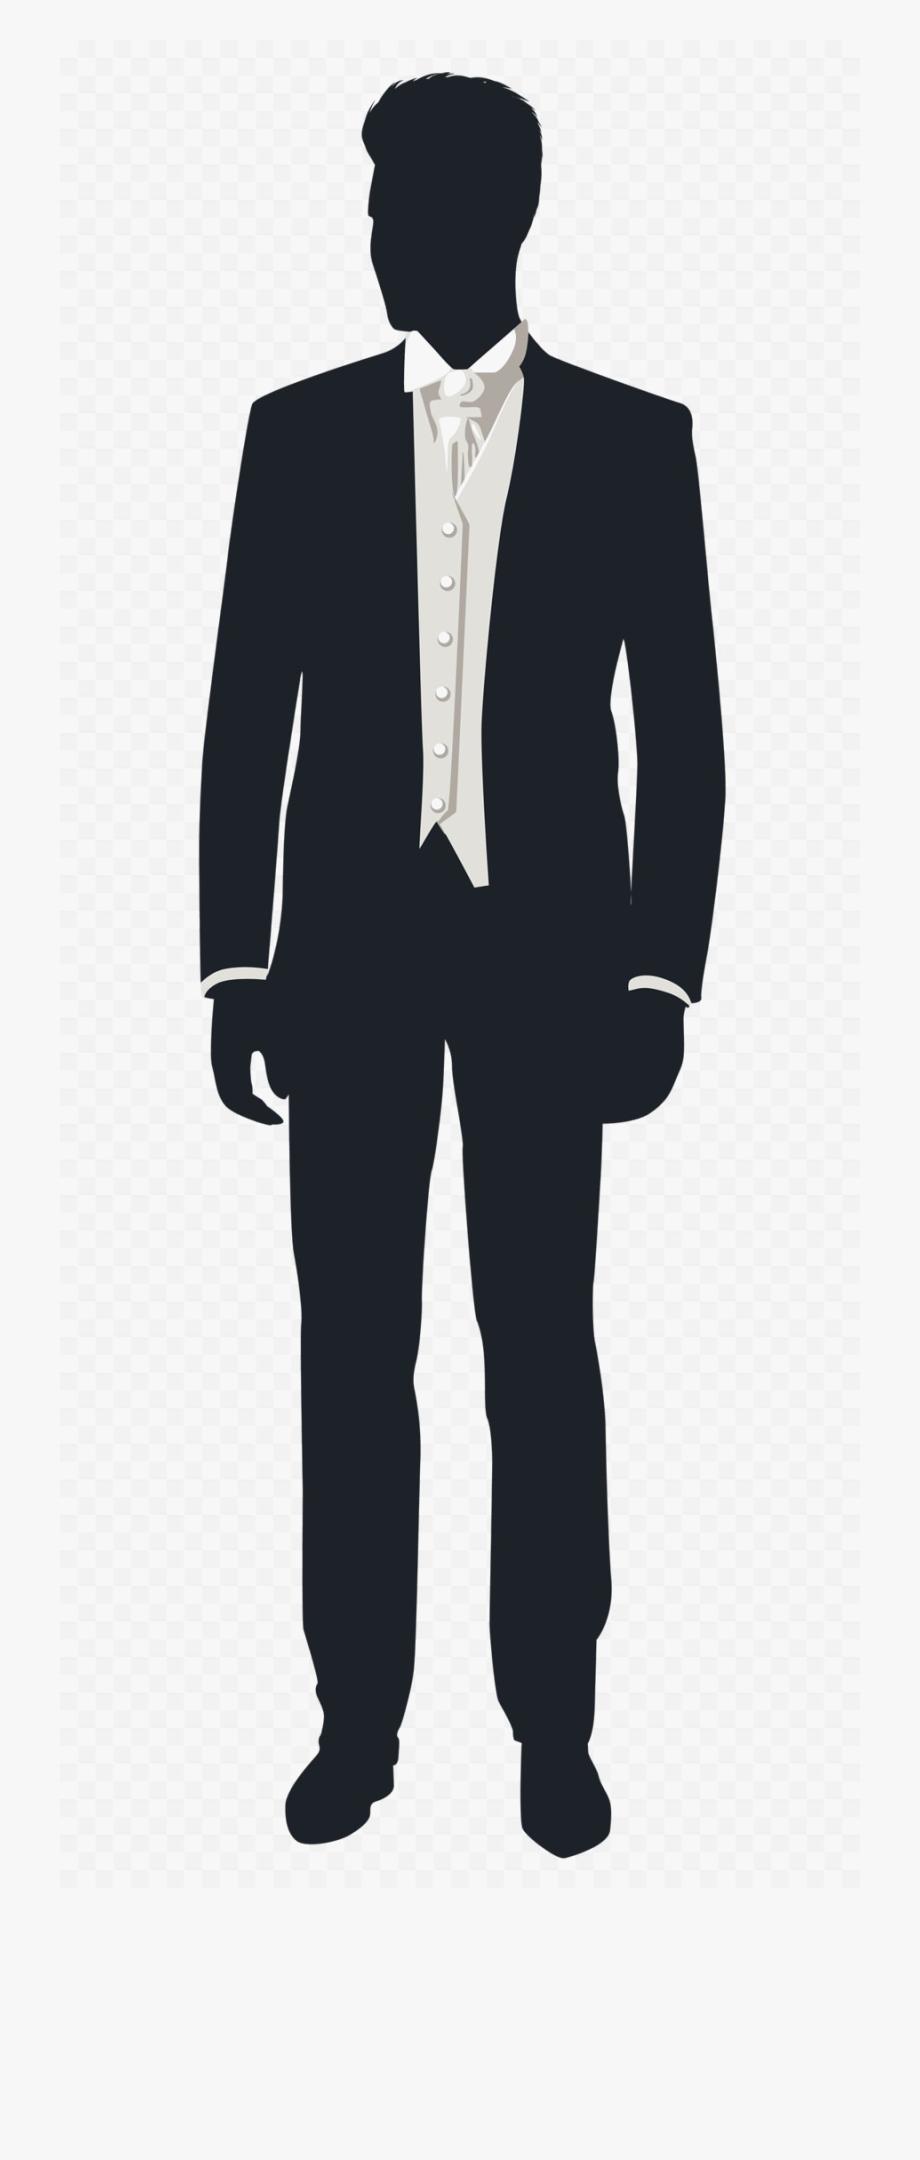 Groom Clipart Transparent Background.